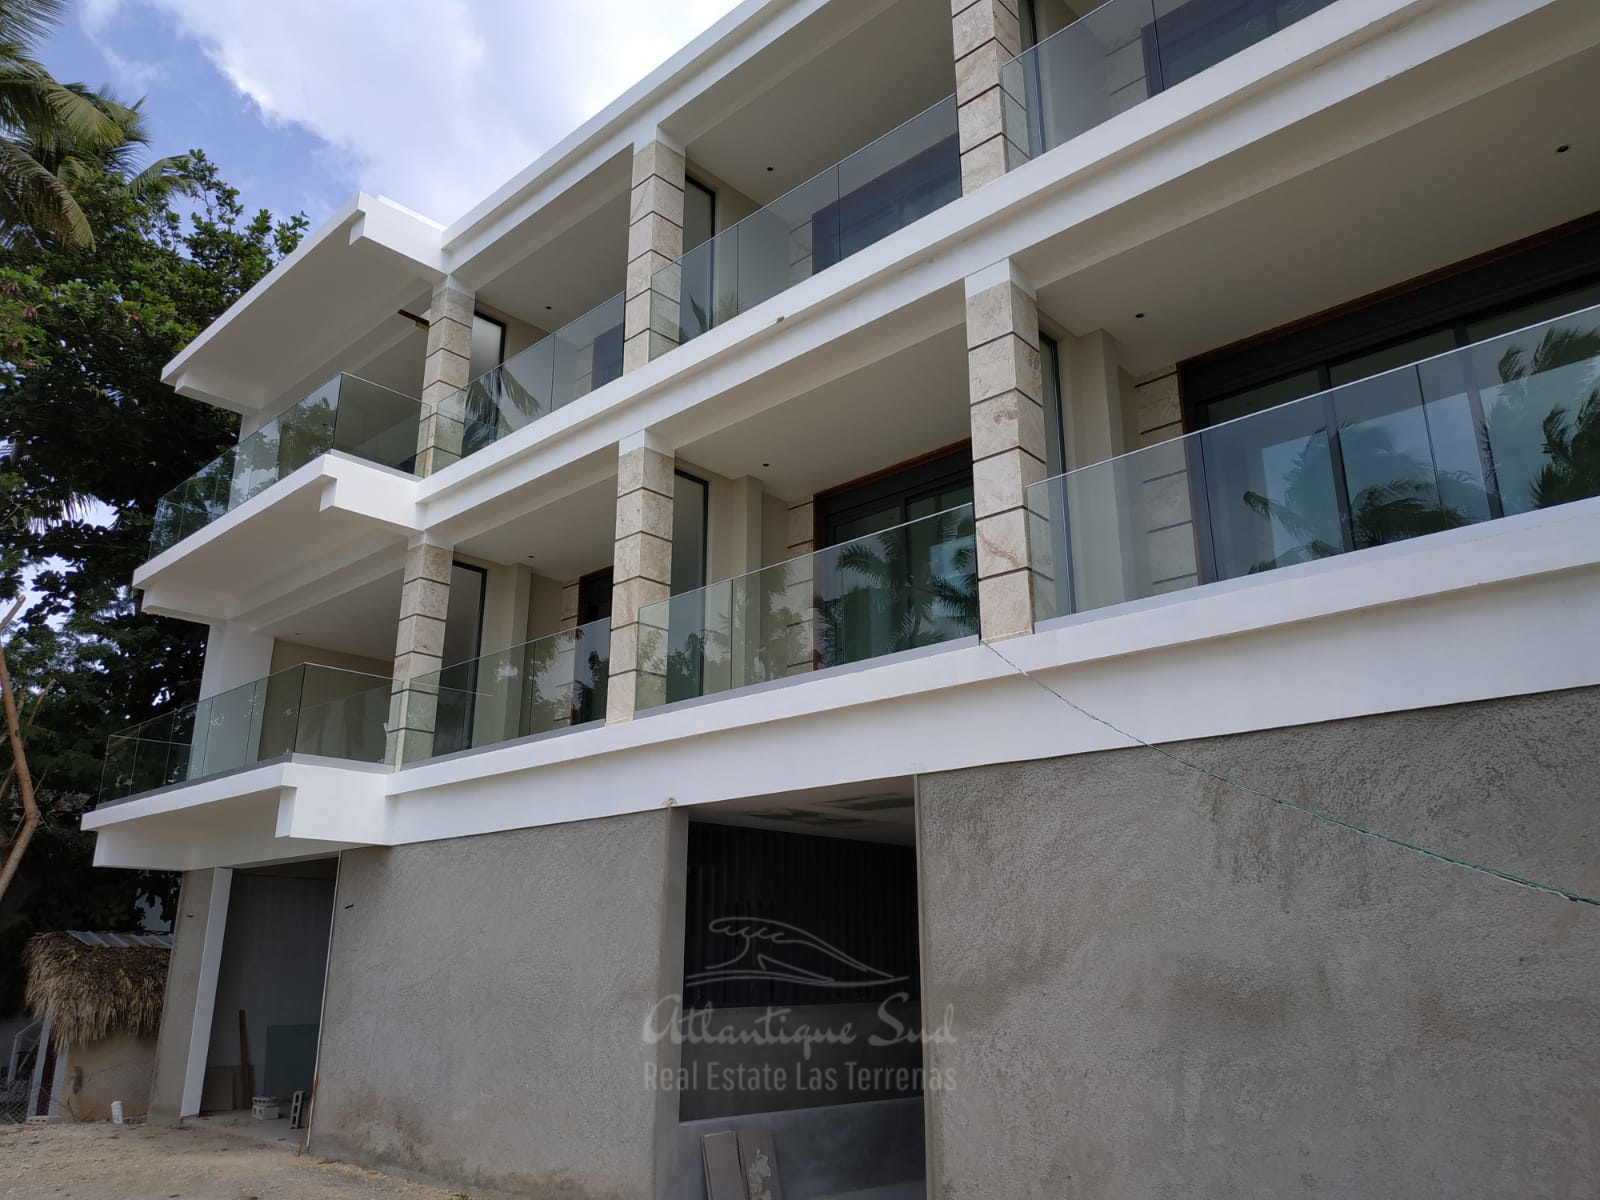 apartment for sale las terrenas beachfront condo31.jpg